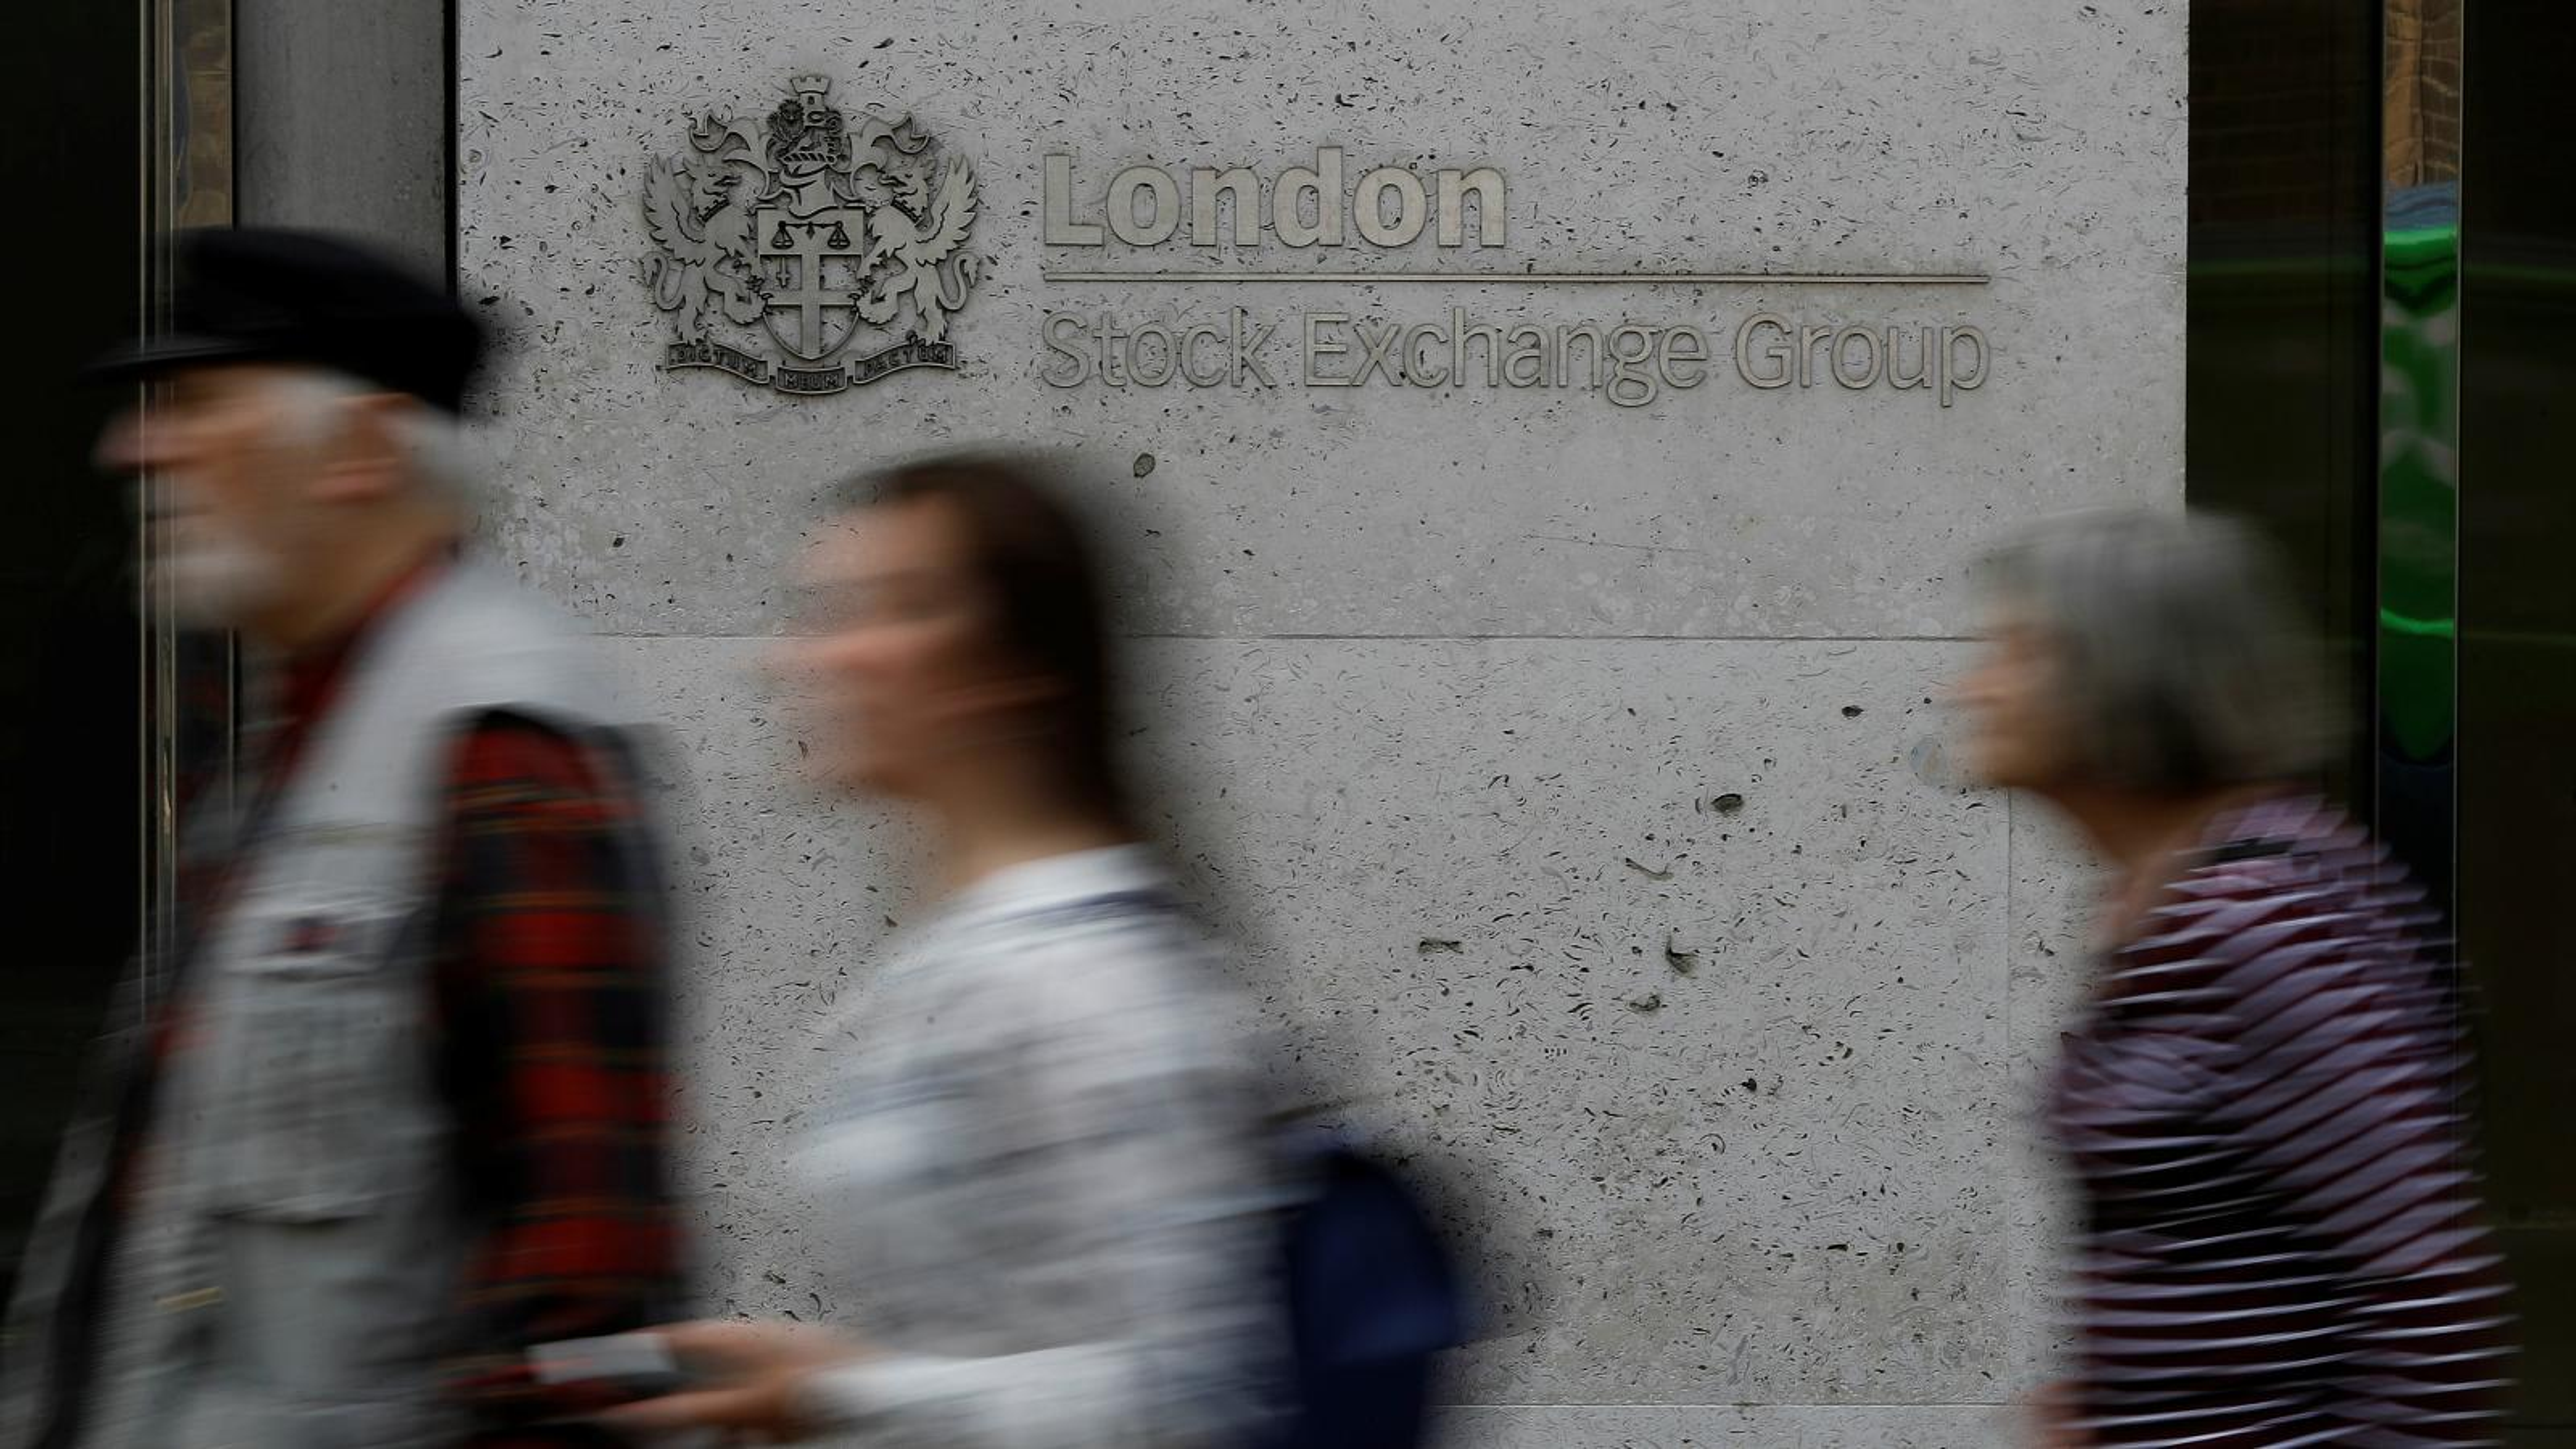 London Stock Exchange Group is best-performing big financial